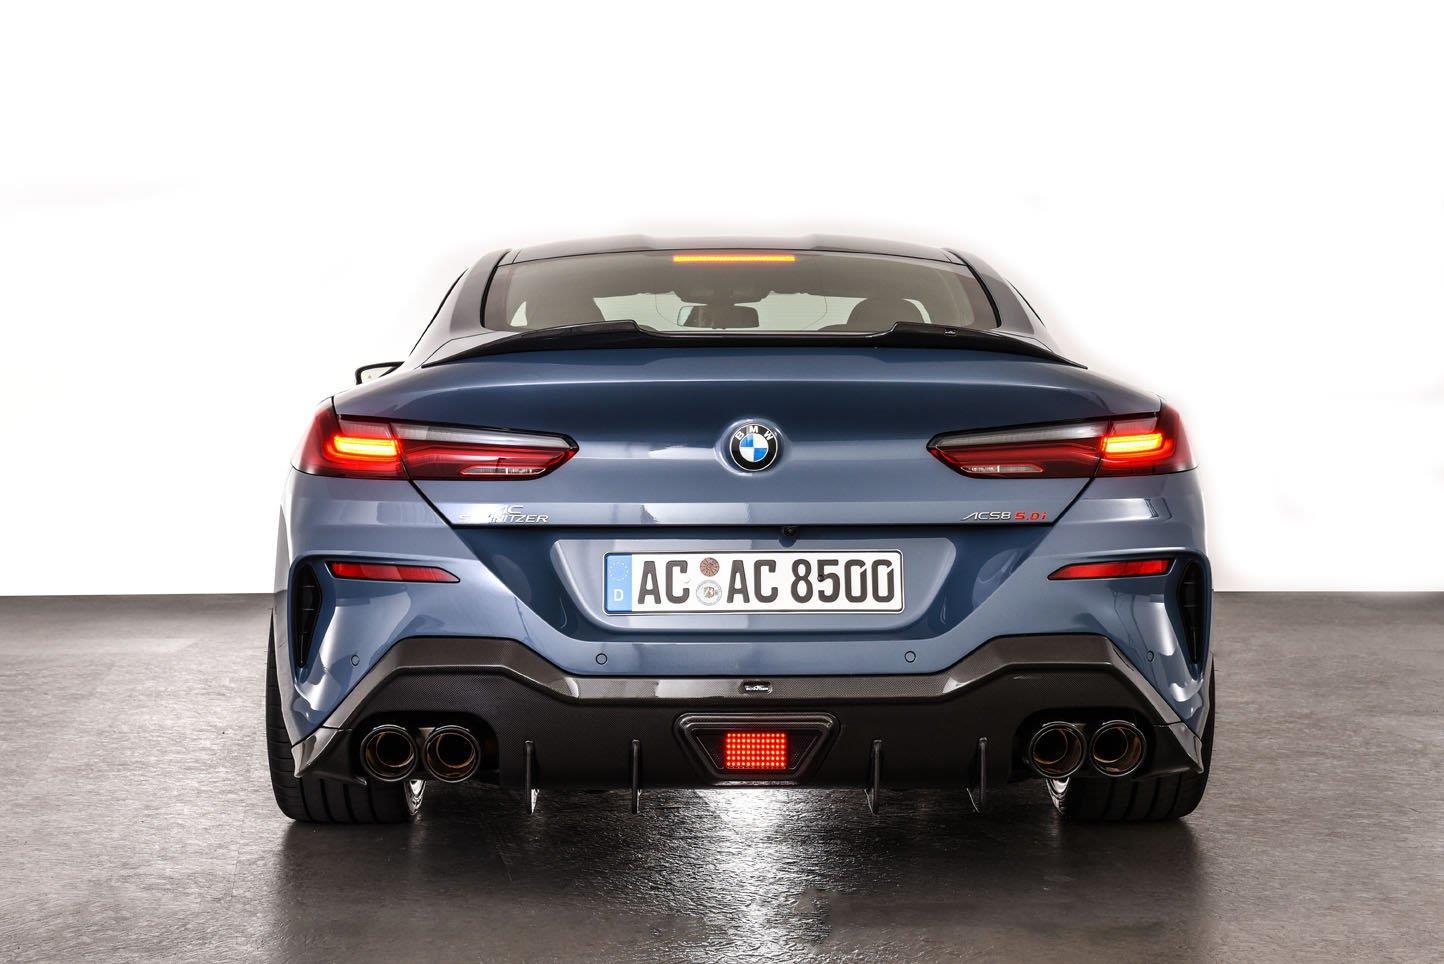 BMW 8-Series tang cong suat, 'lot xac' voi ban do moi hinh anh 6